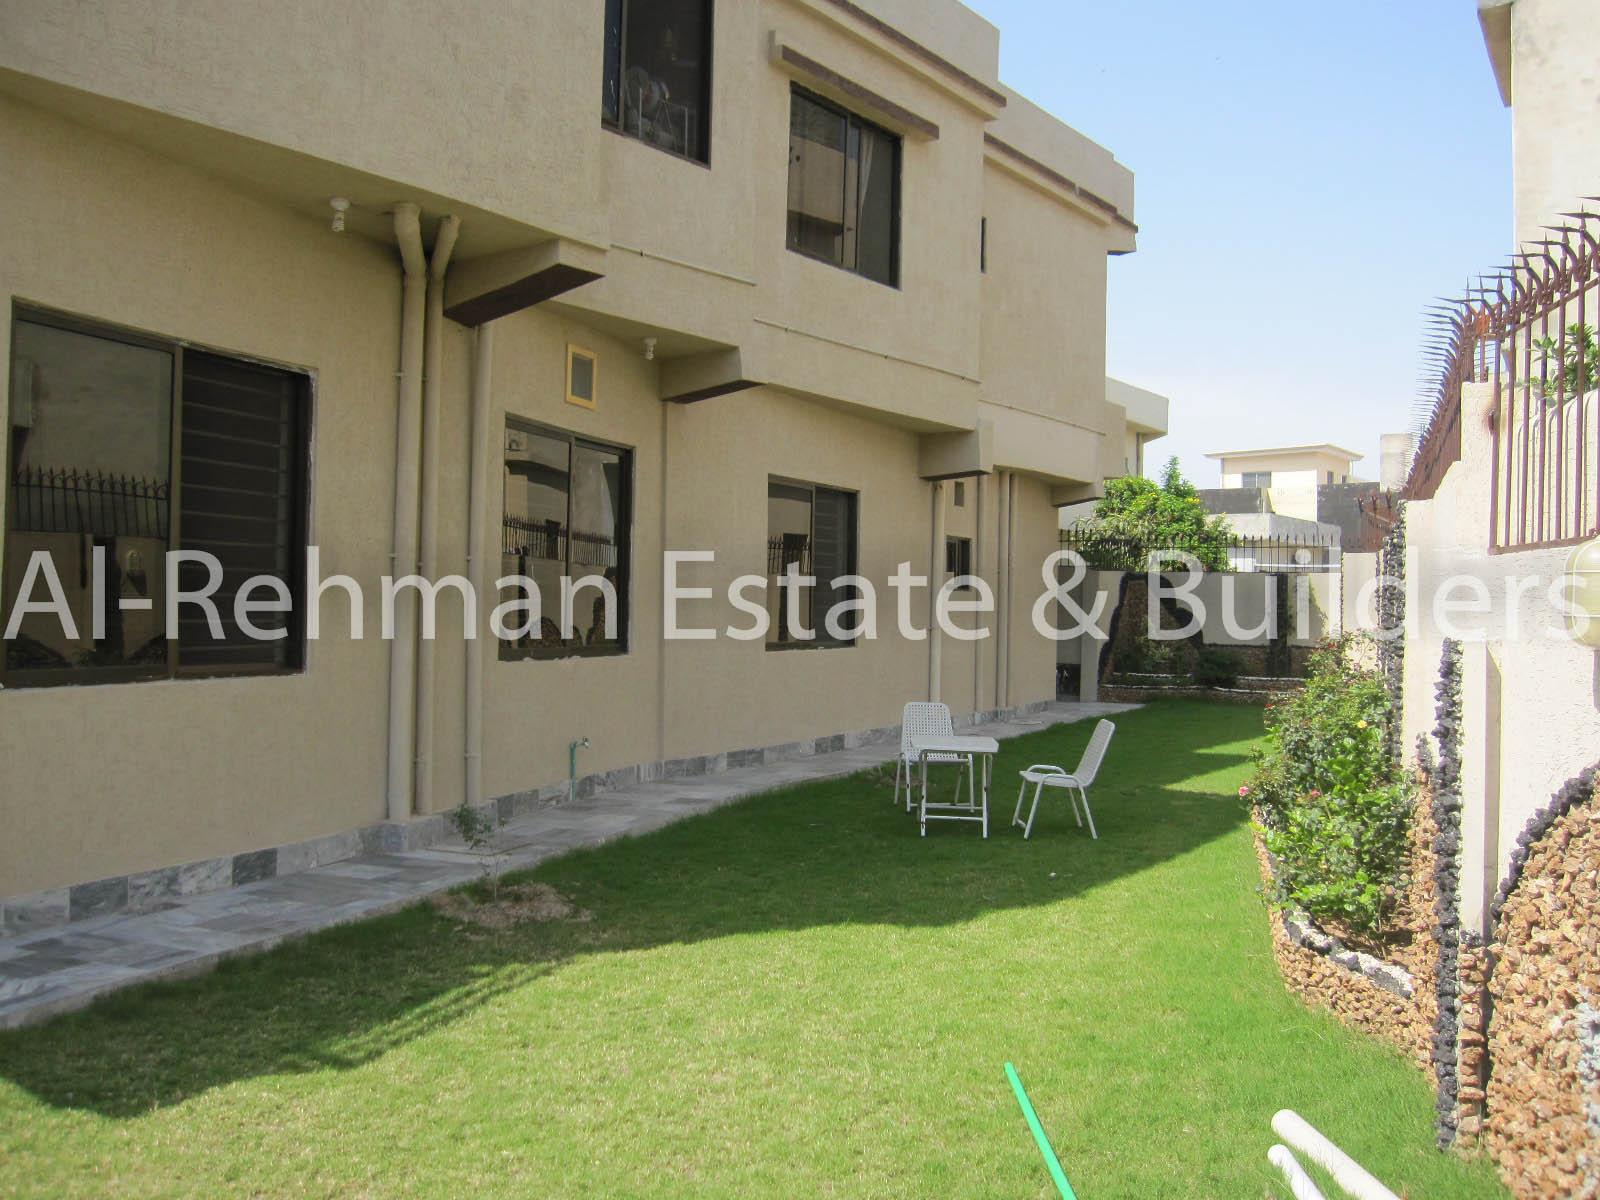 Al Rehman Estate Modern House For Sale In Islamabad